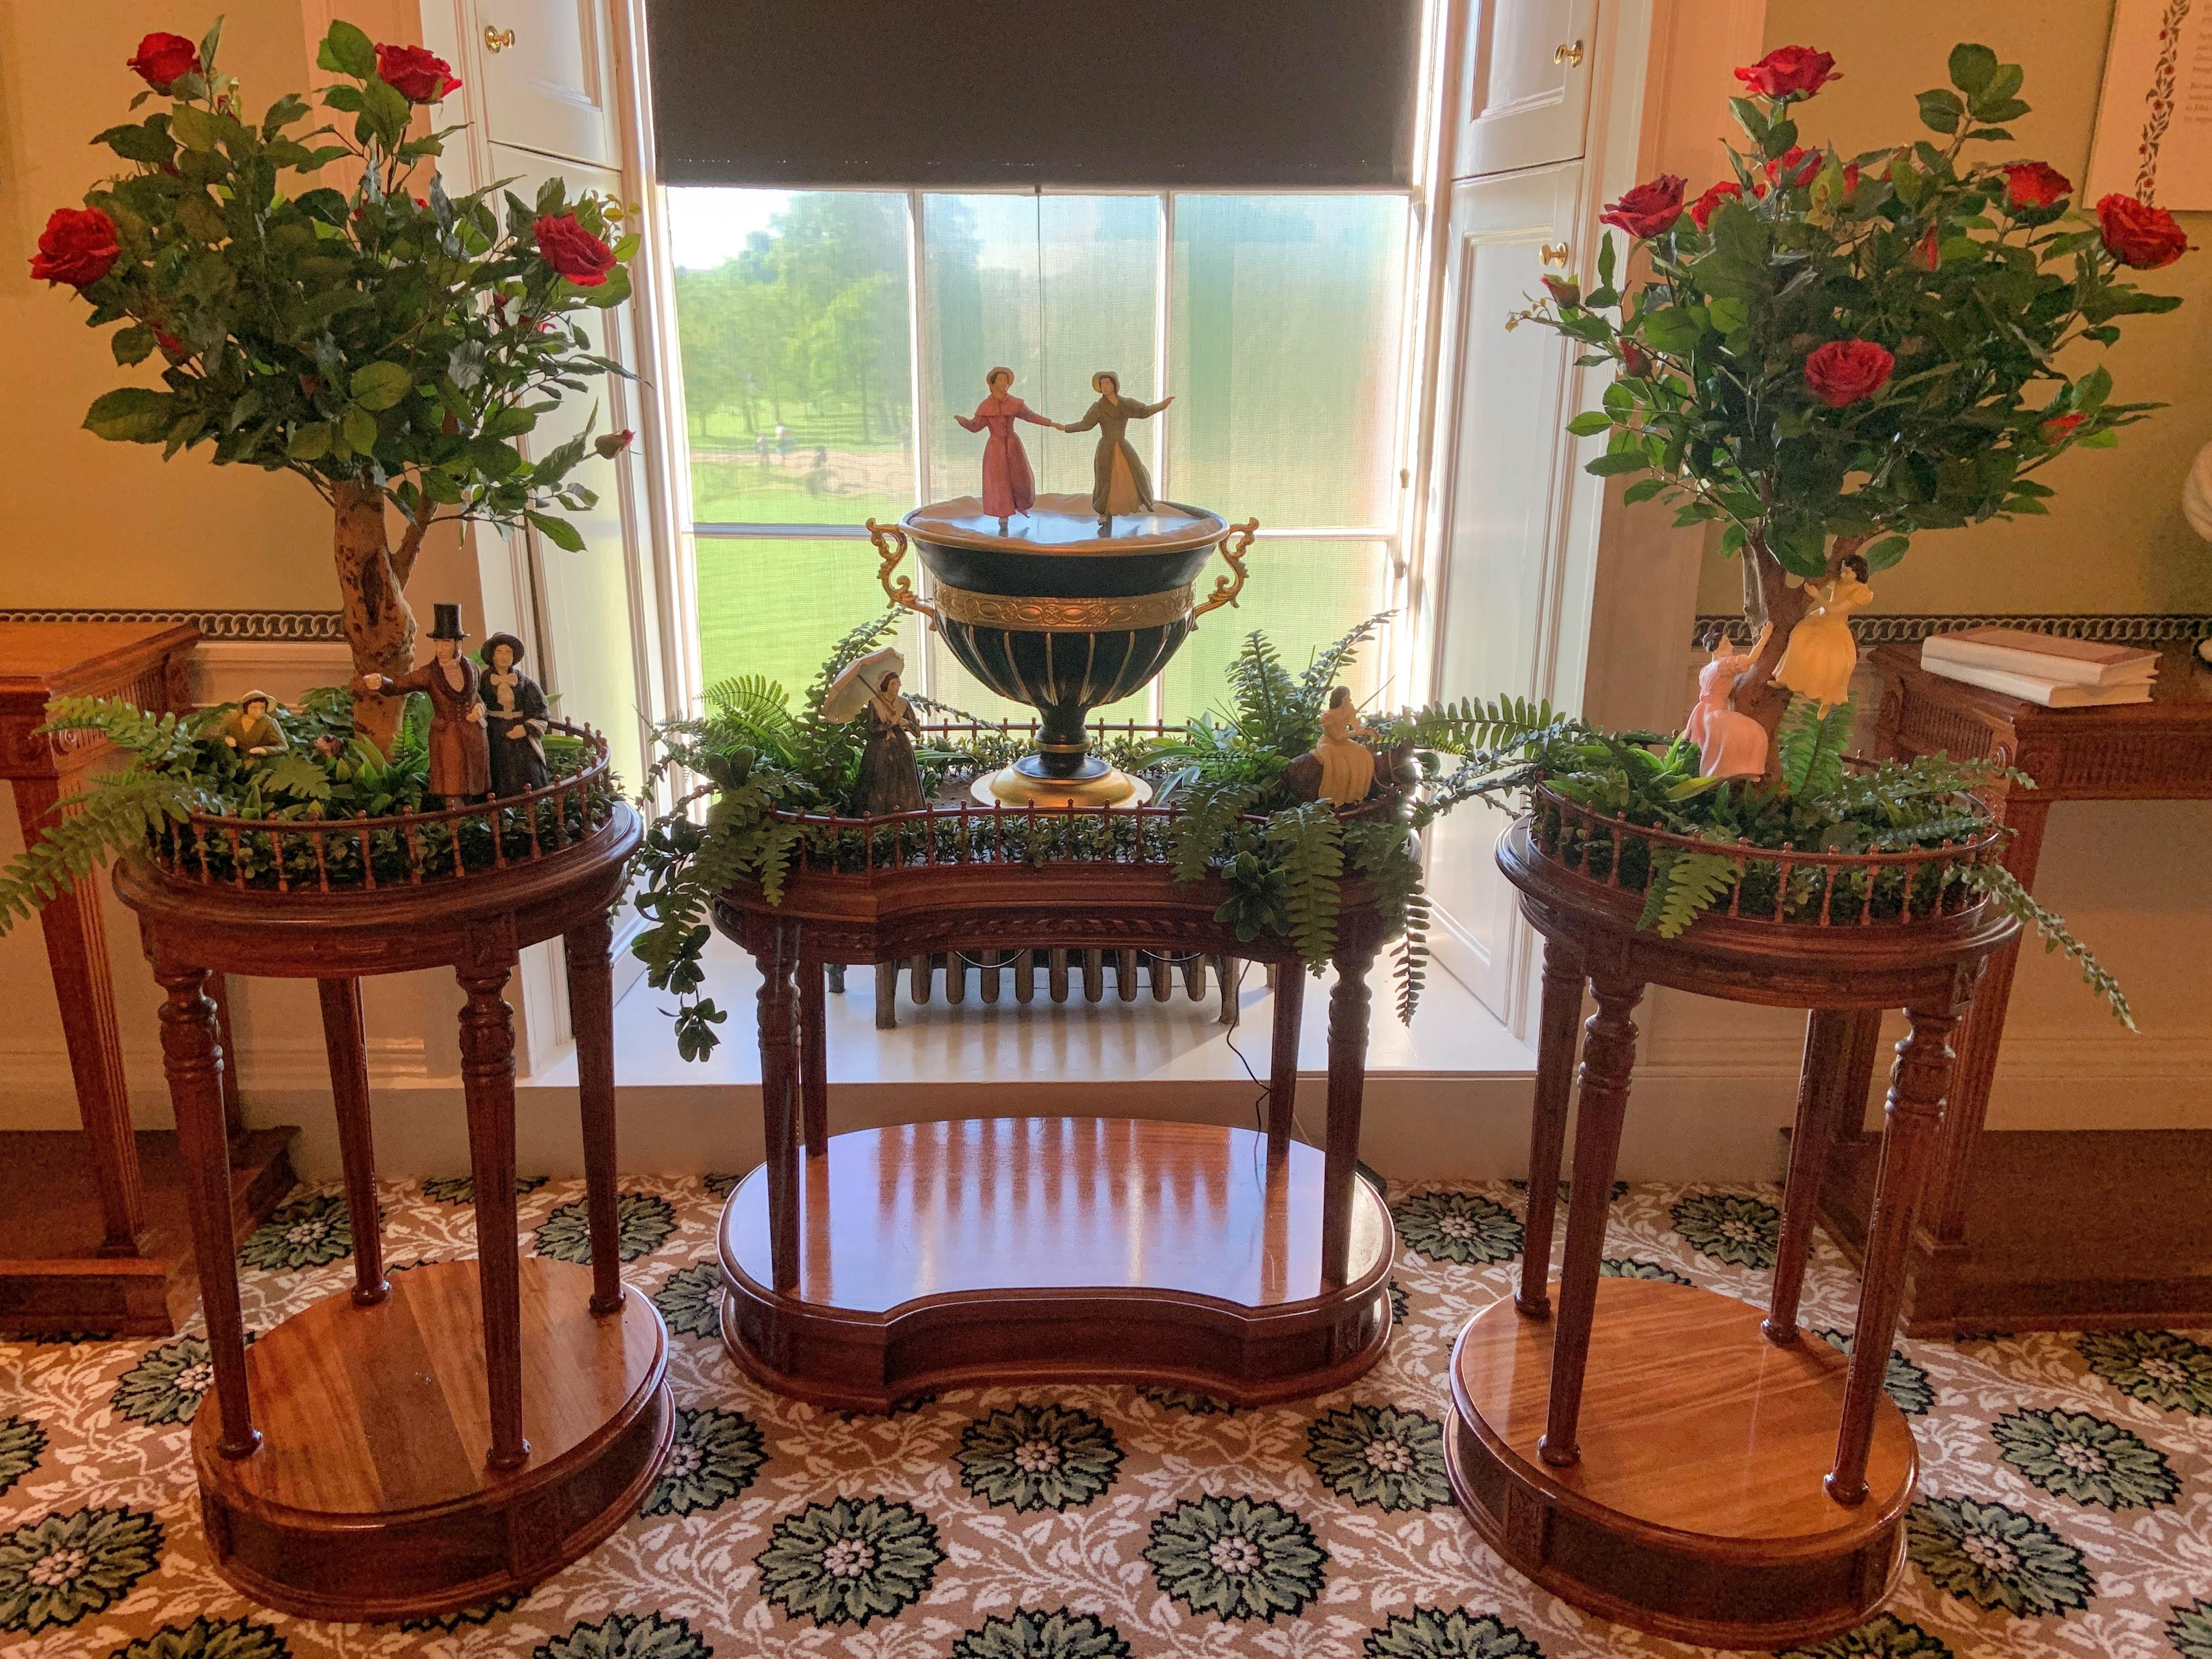 Kensington Palace - Victoria: A Royal Childhood